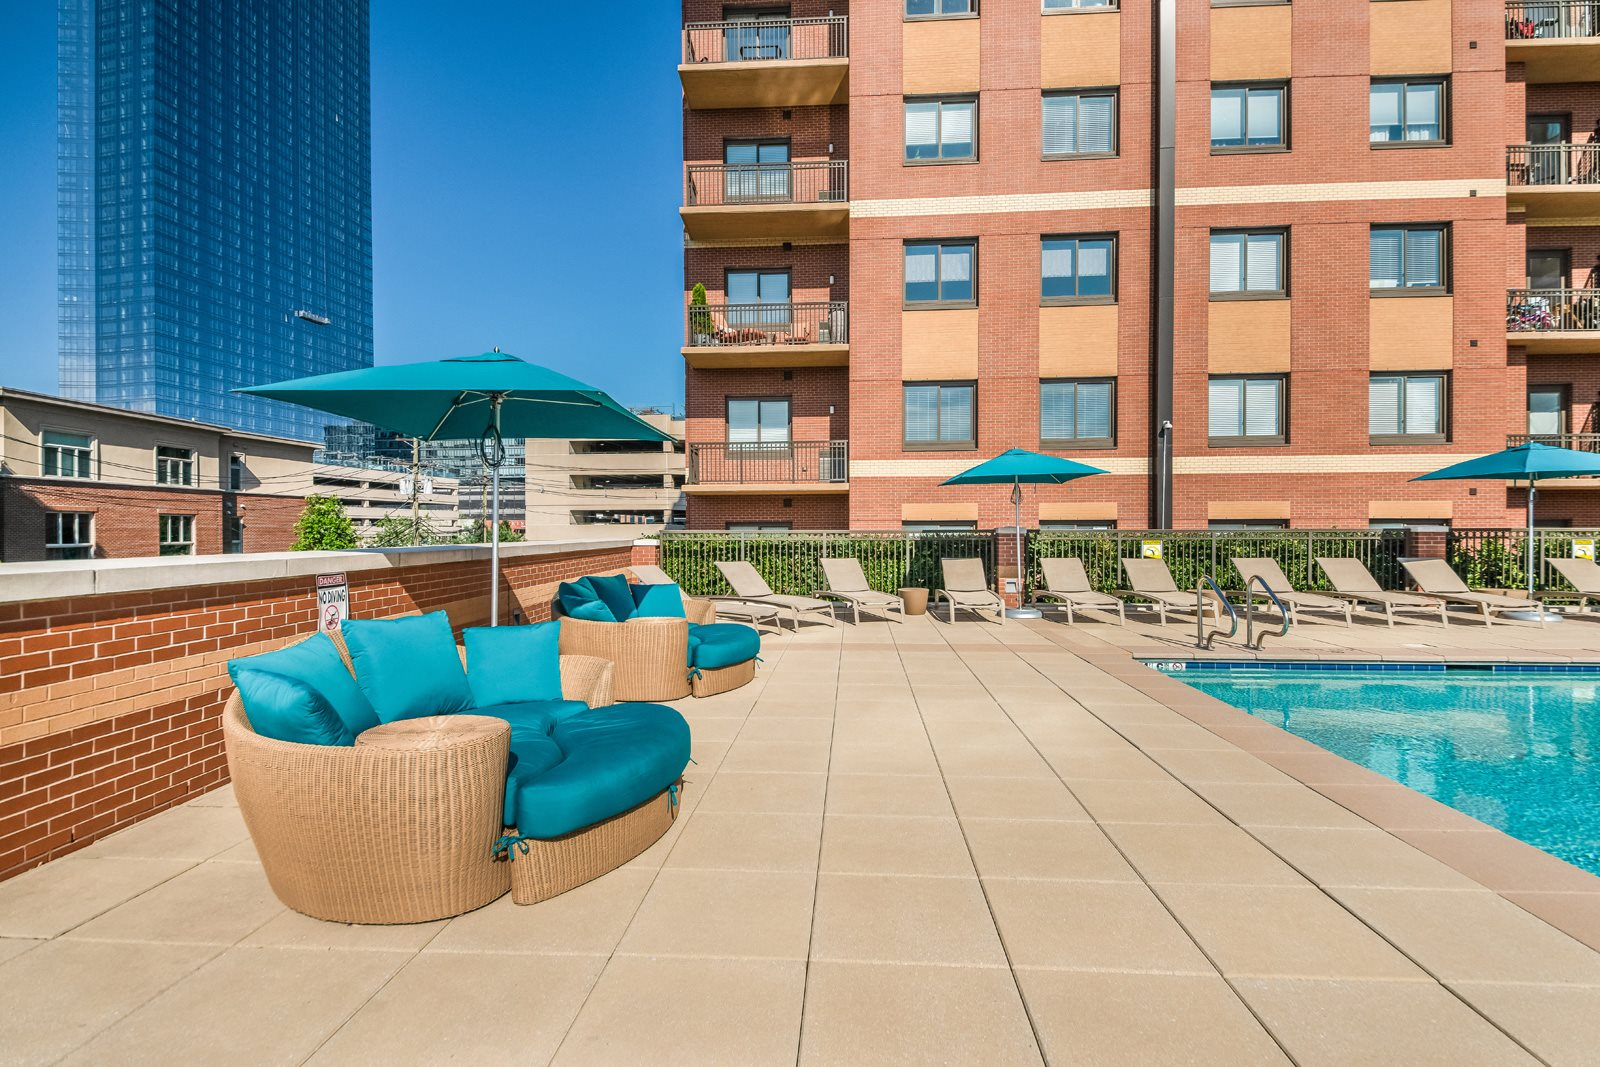 Lounge Area by  Heated Pool at Twenty50 by Windsor, 07024, NJ